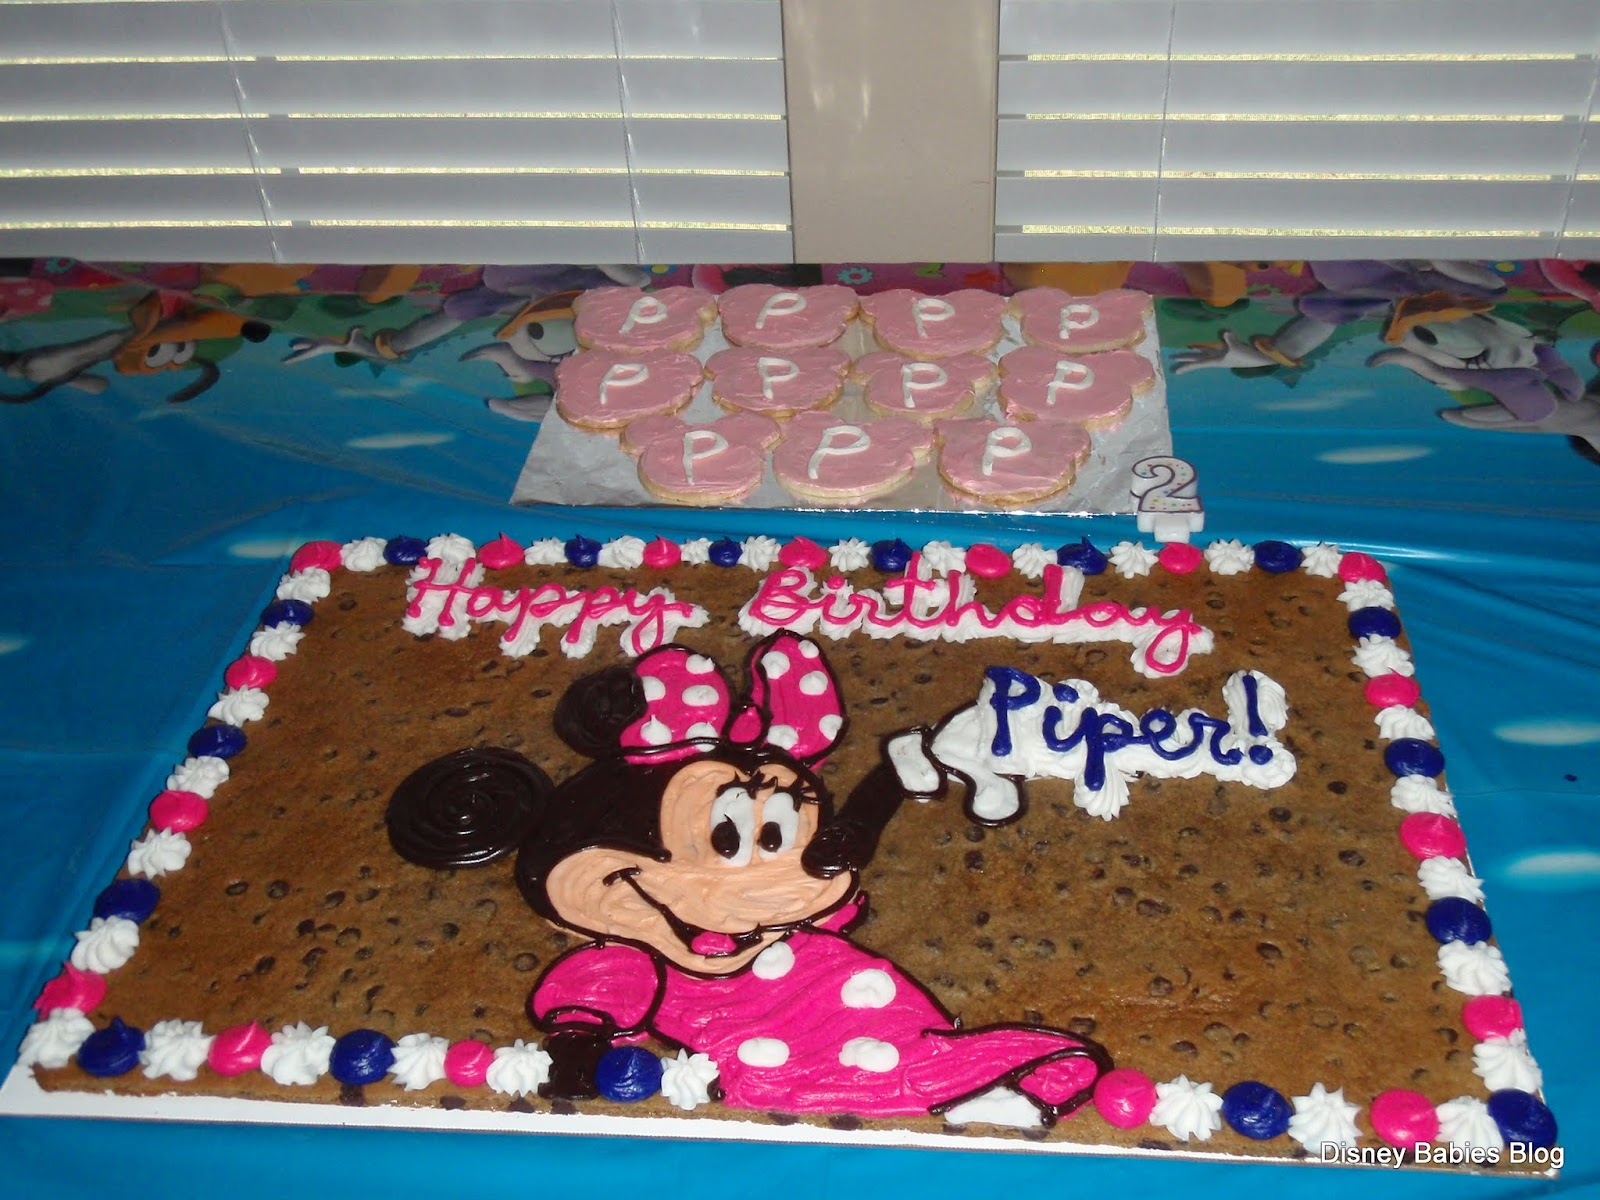 disney babies blog  a minnie mouse birthday